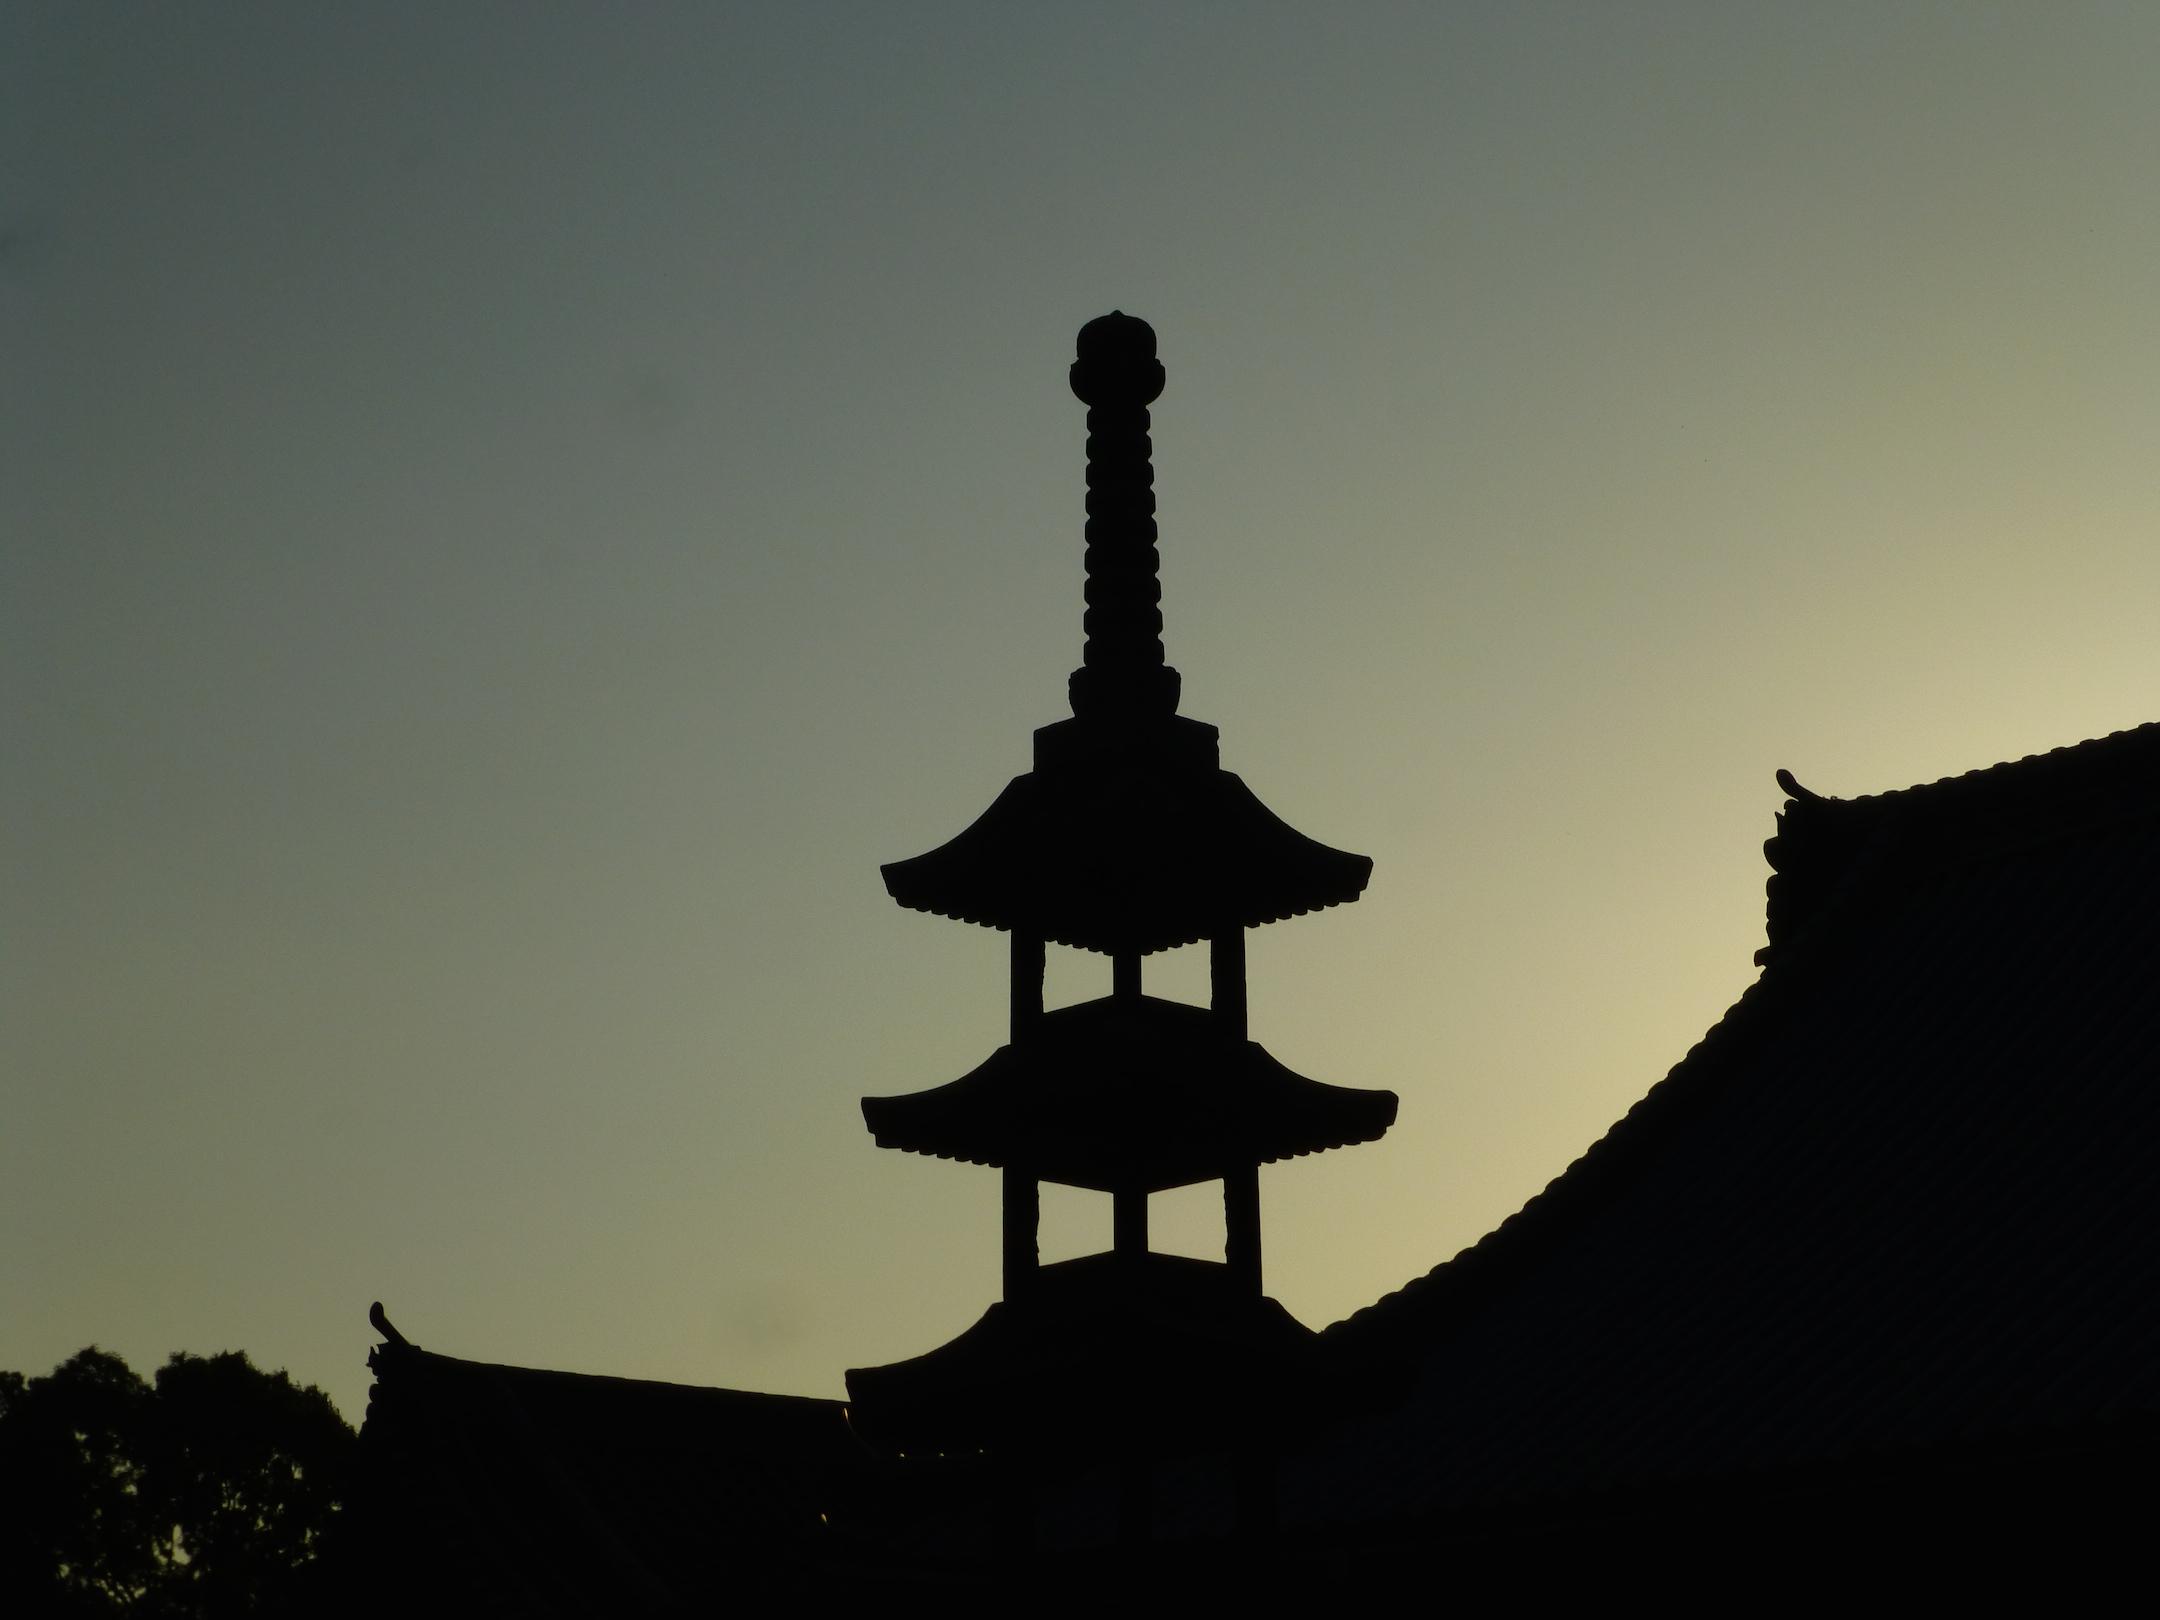 Temple silhouet against sunset sky